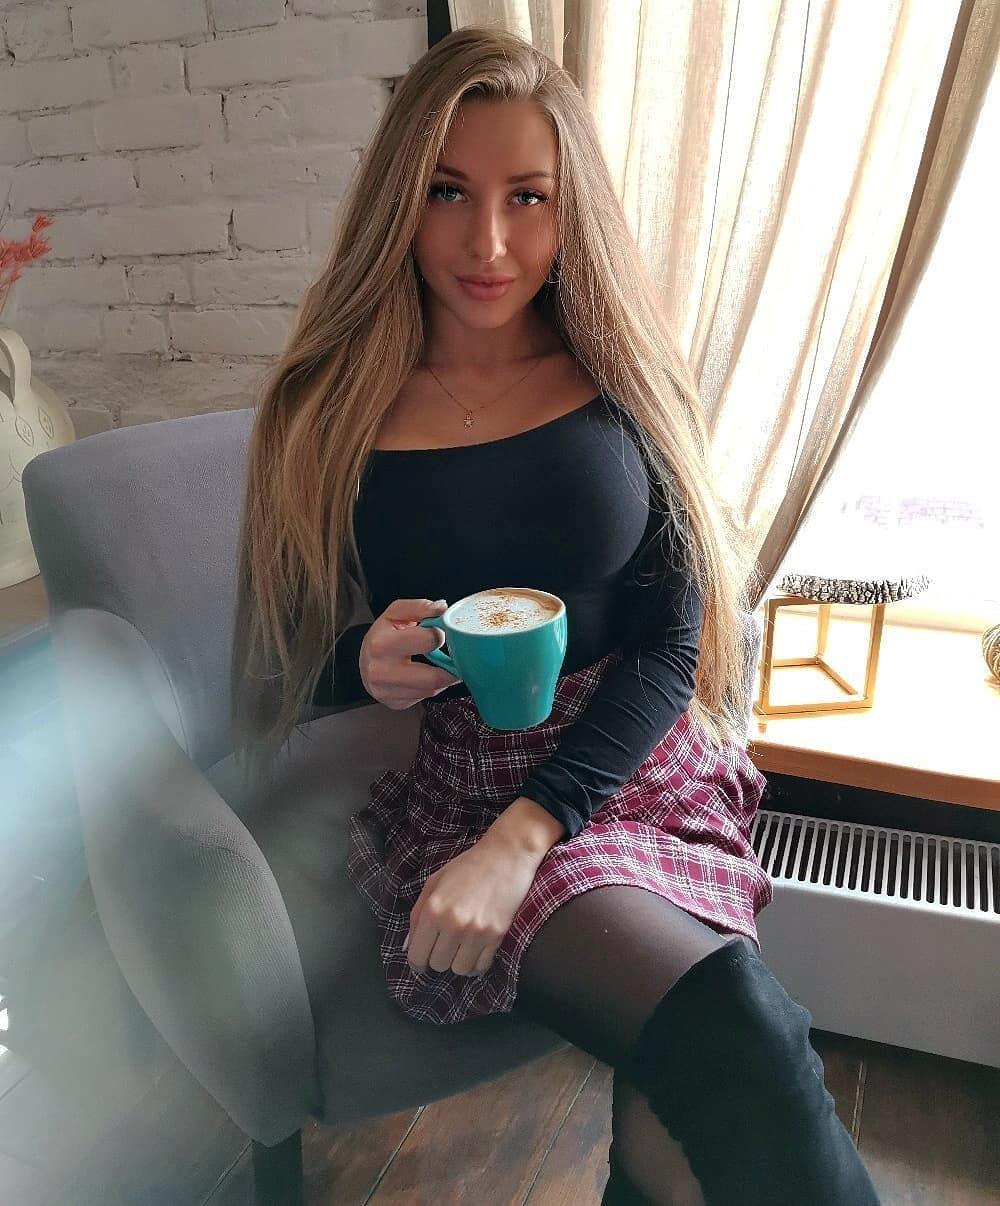 Alina-Cherepanova-Wallpapers-Insta-Fit-Bio-2